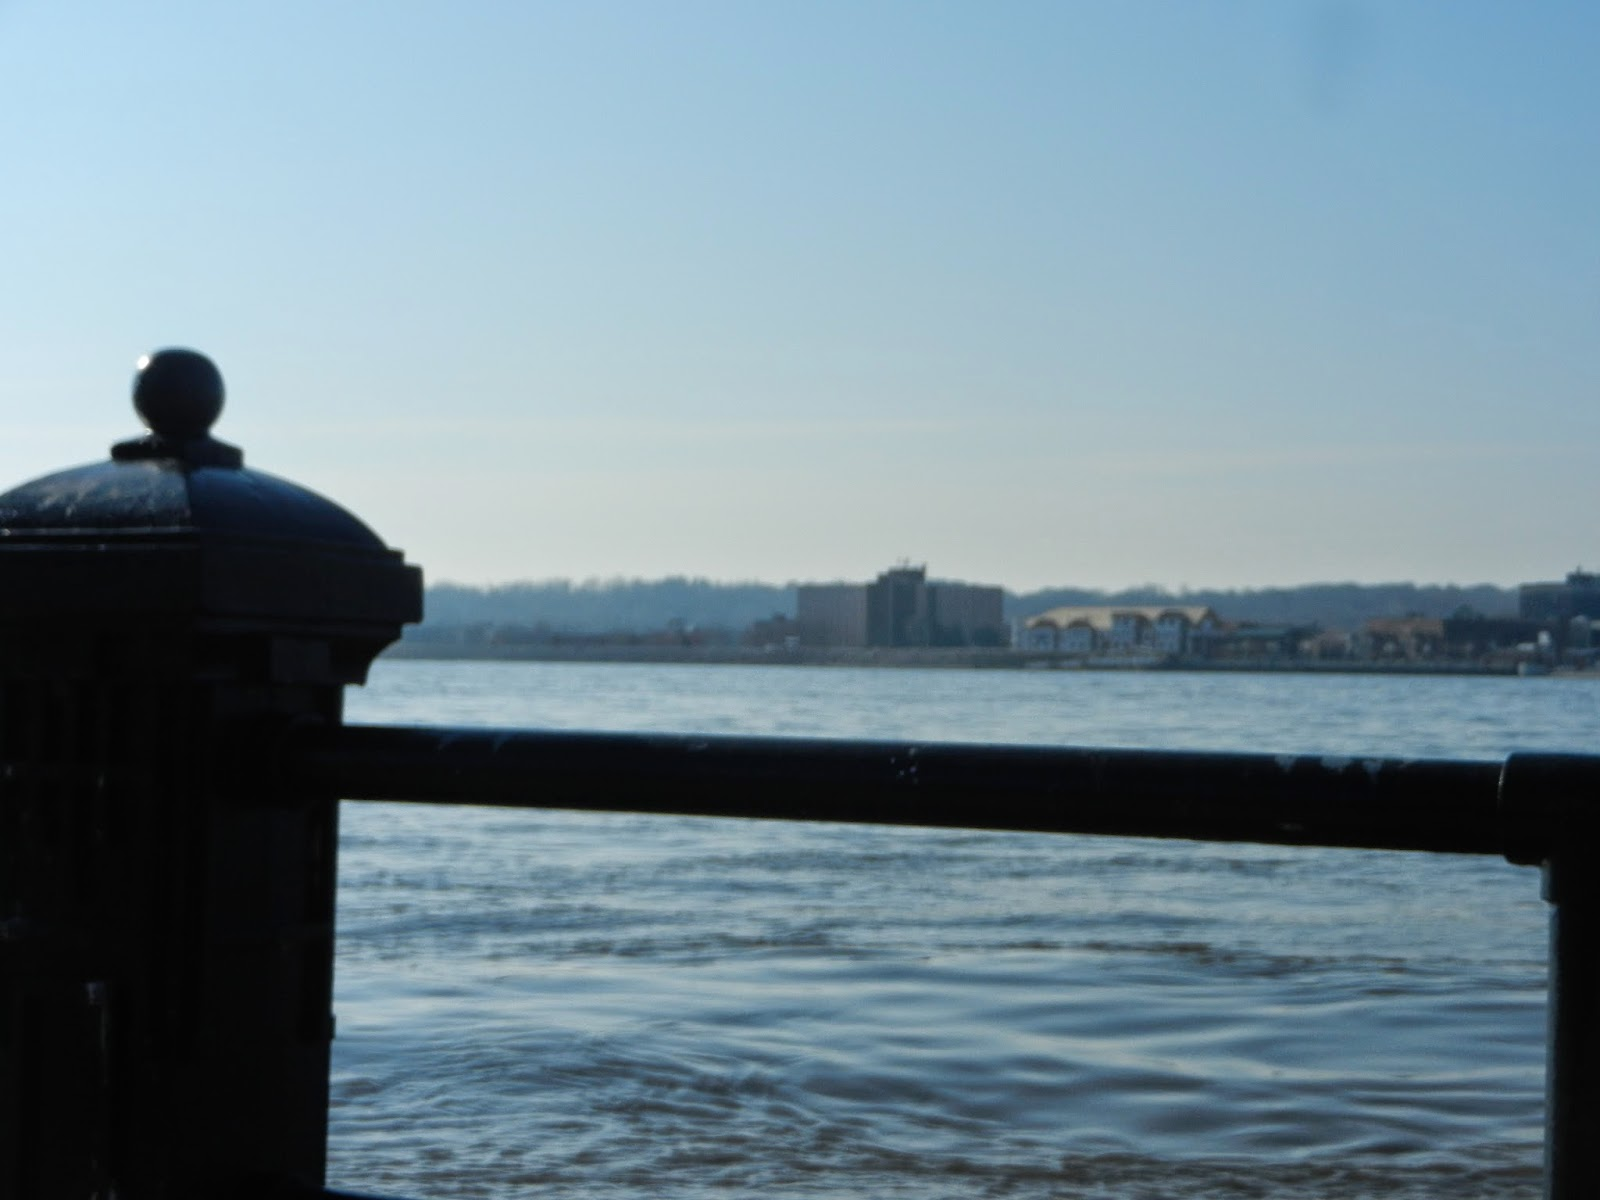 mississippi river davenport